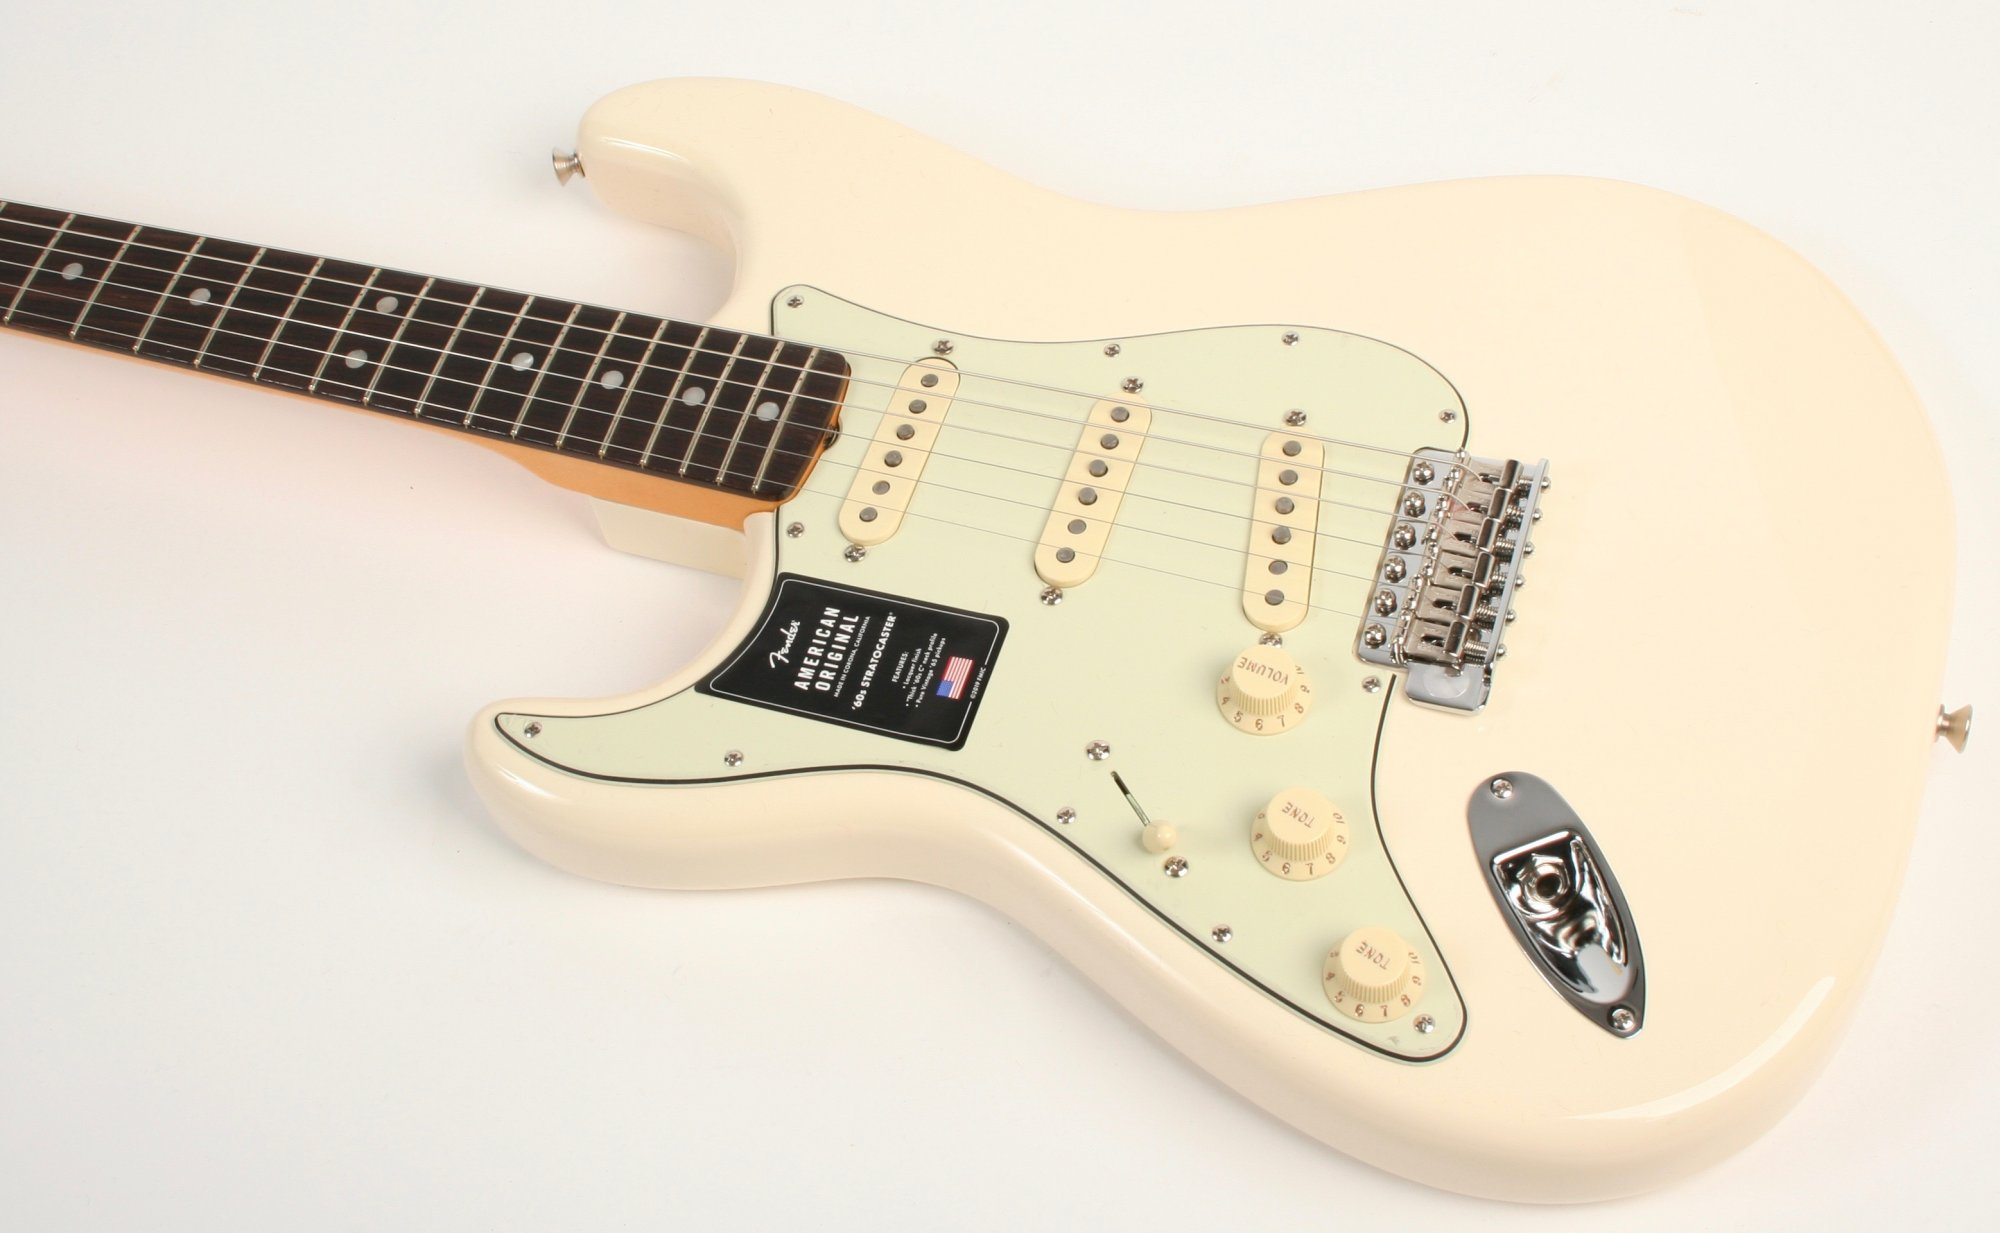 Fender American Original '60s Stratocaster Rosewood Fingerboard Olympic White Left Handed